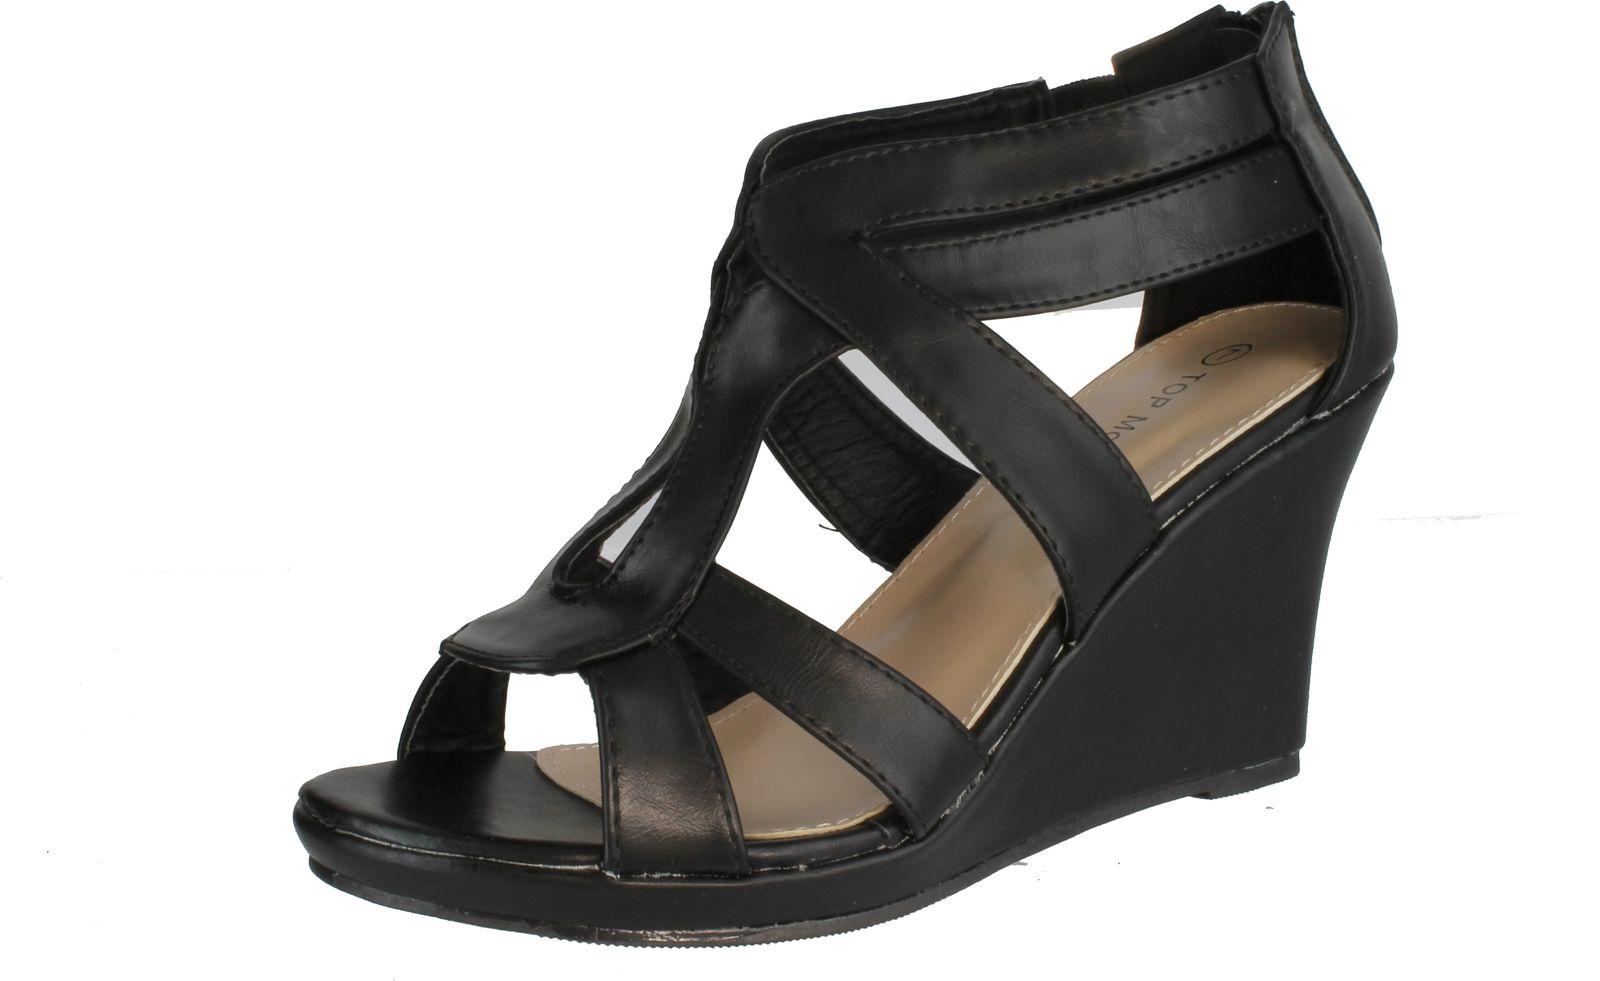 Top Moda Womens Job-8 Gladiator Round Peep Toe Platform Sandals Ankle Strappy Wedge Heel at Sears.com